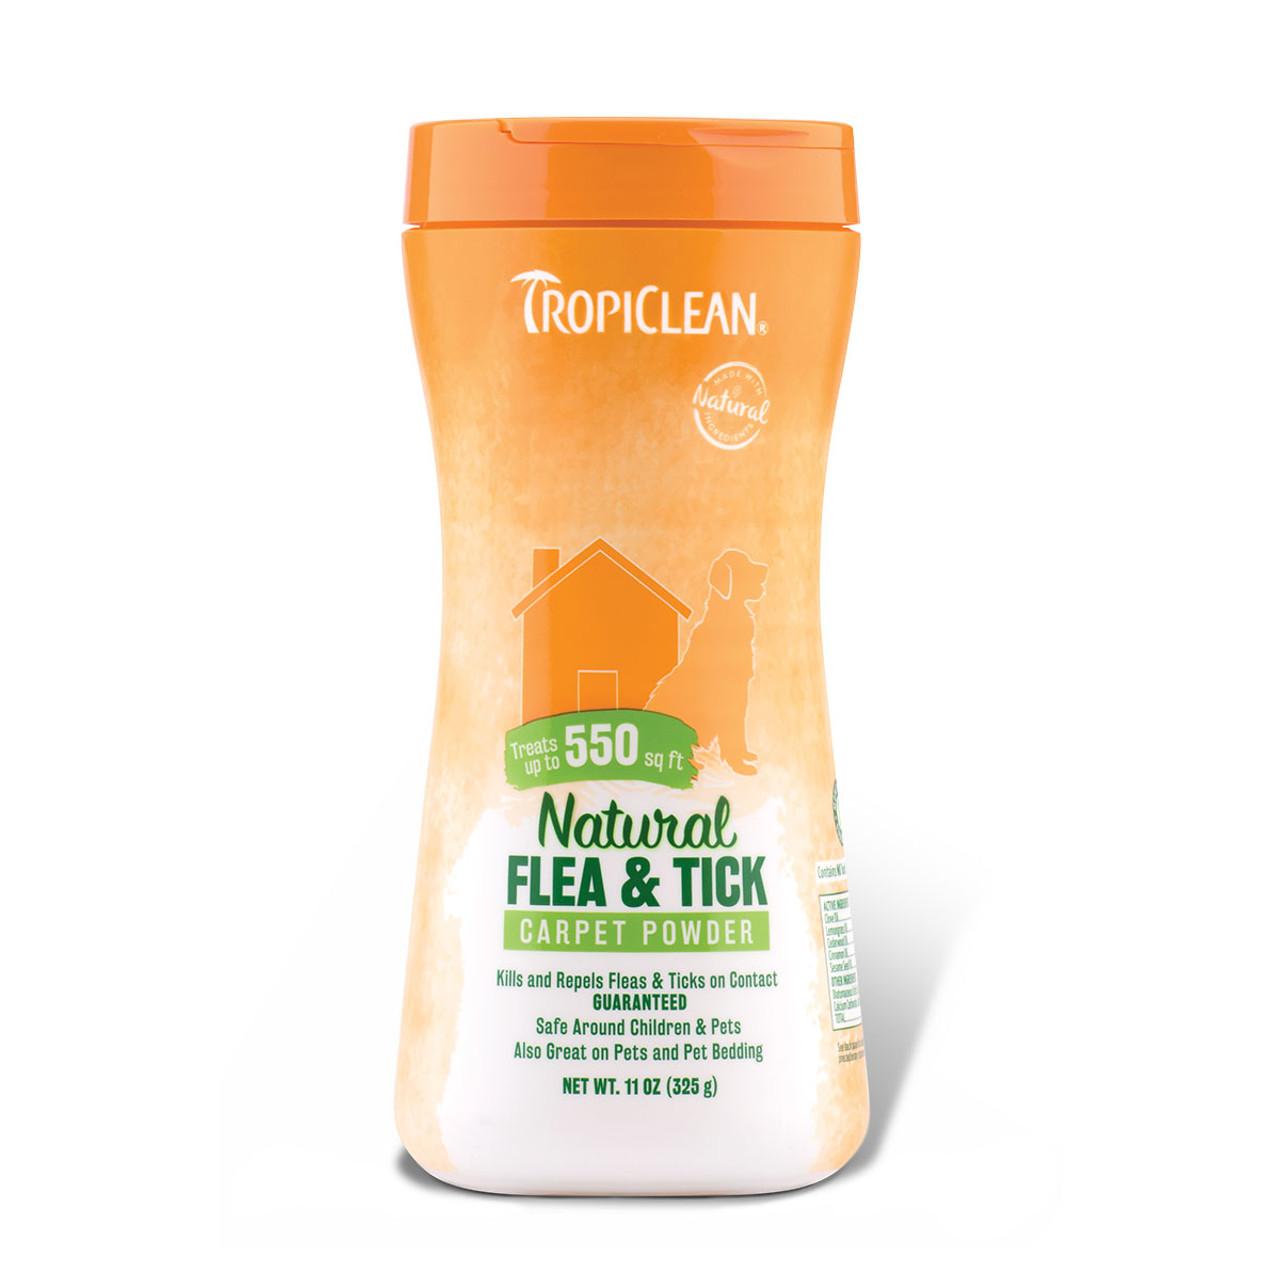 TropiClean Natural Flea & Tick Carpet & Pet Powder